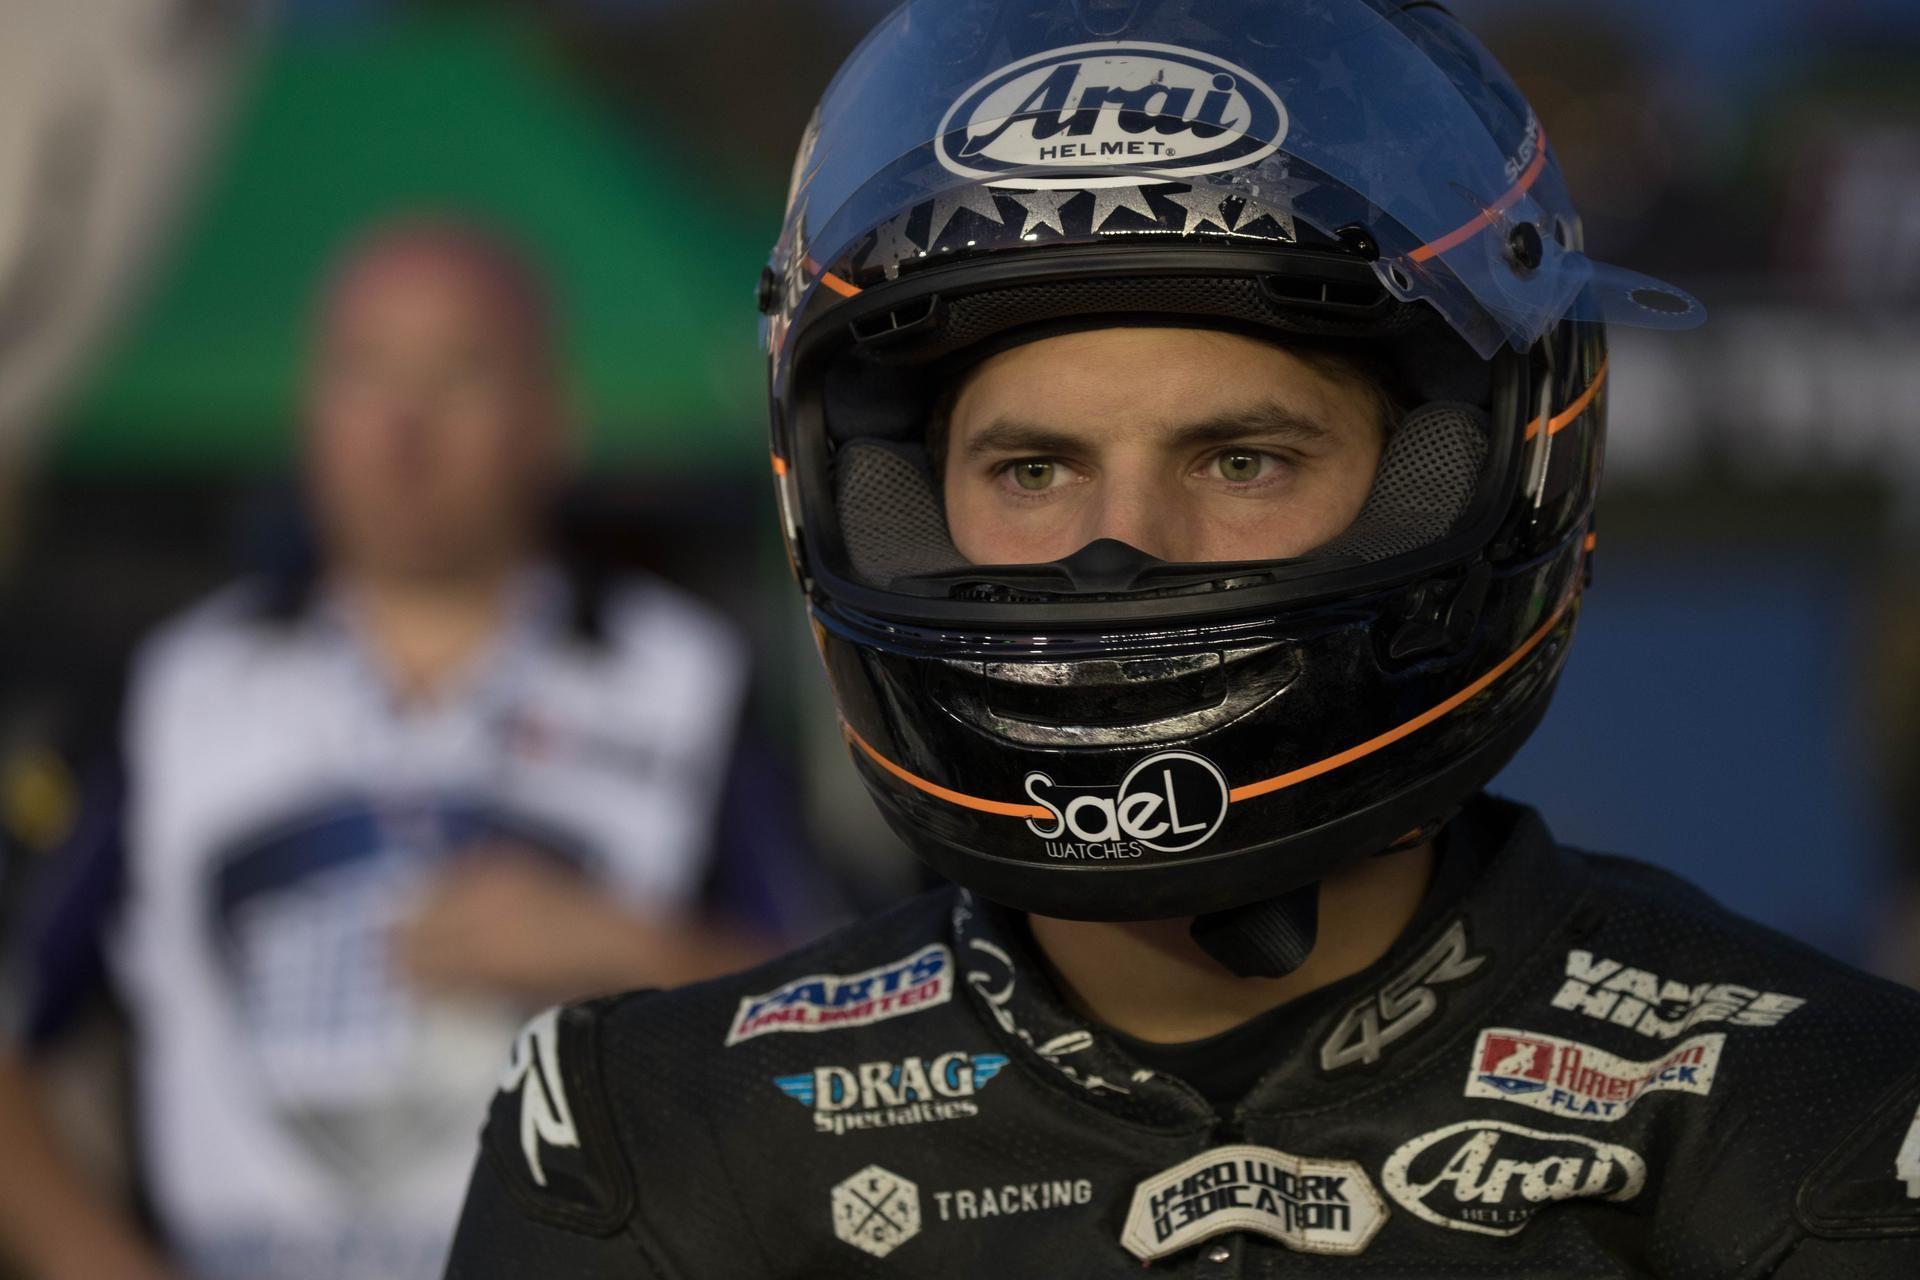 Latus Motors Racing Recruits Rispoli For Aftproductiontwins Daytona Beach Fla January 13 2020 Latus Motors Racing In 2020 Racing Racing Events Motorcycle News